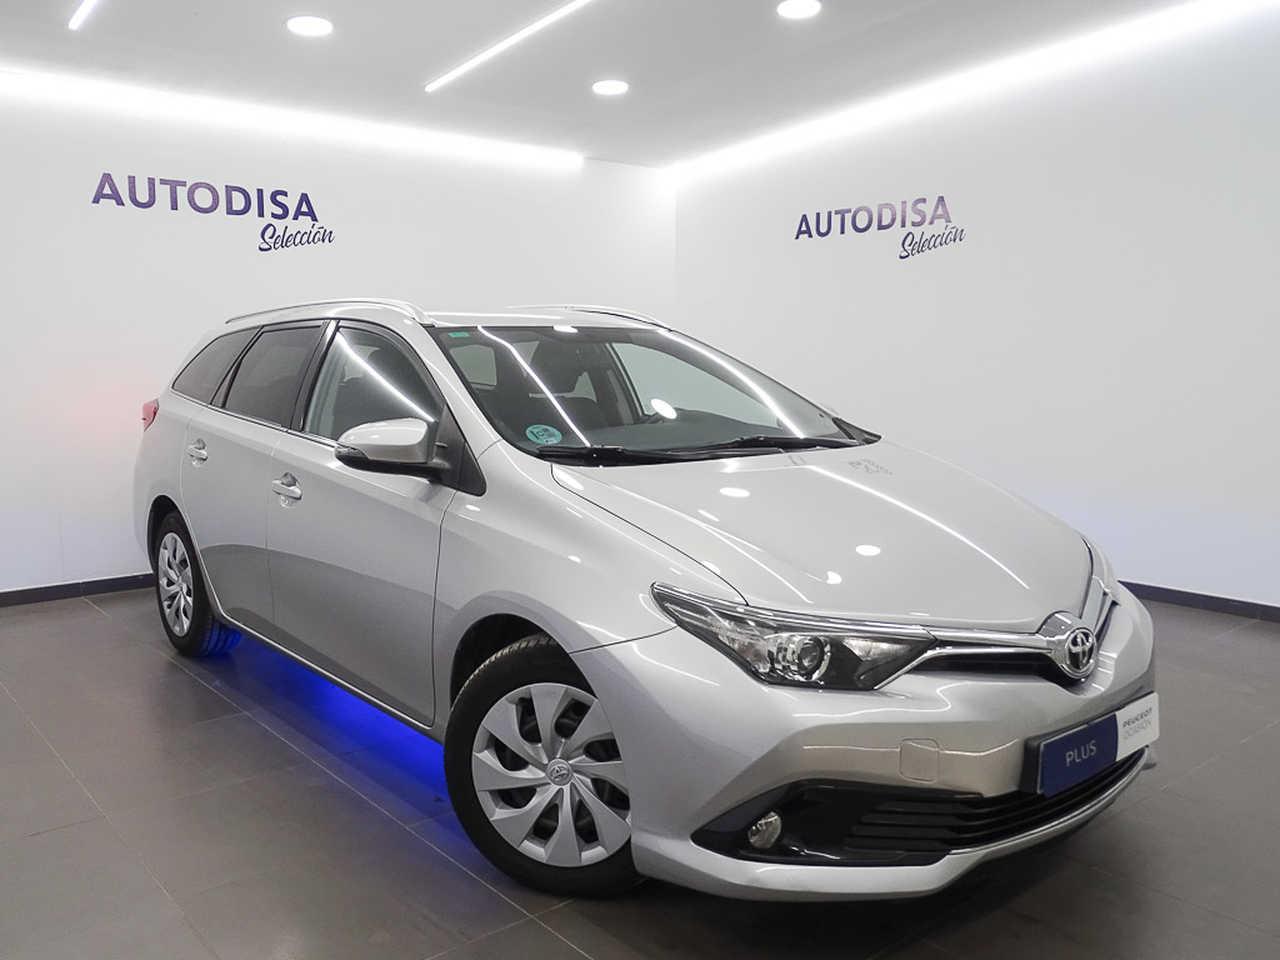 Array Toyota Auris 2016 Diésel por 10.495€ en Valencia